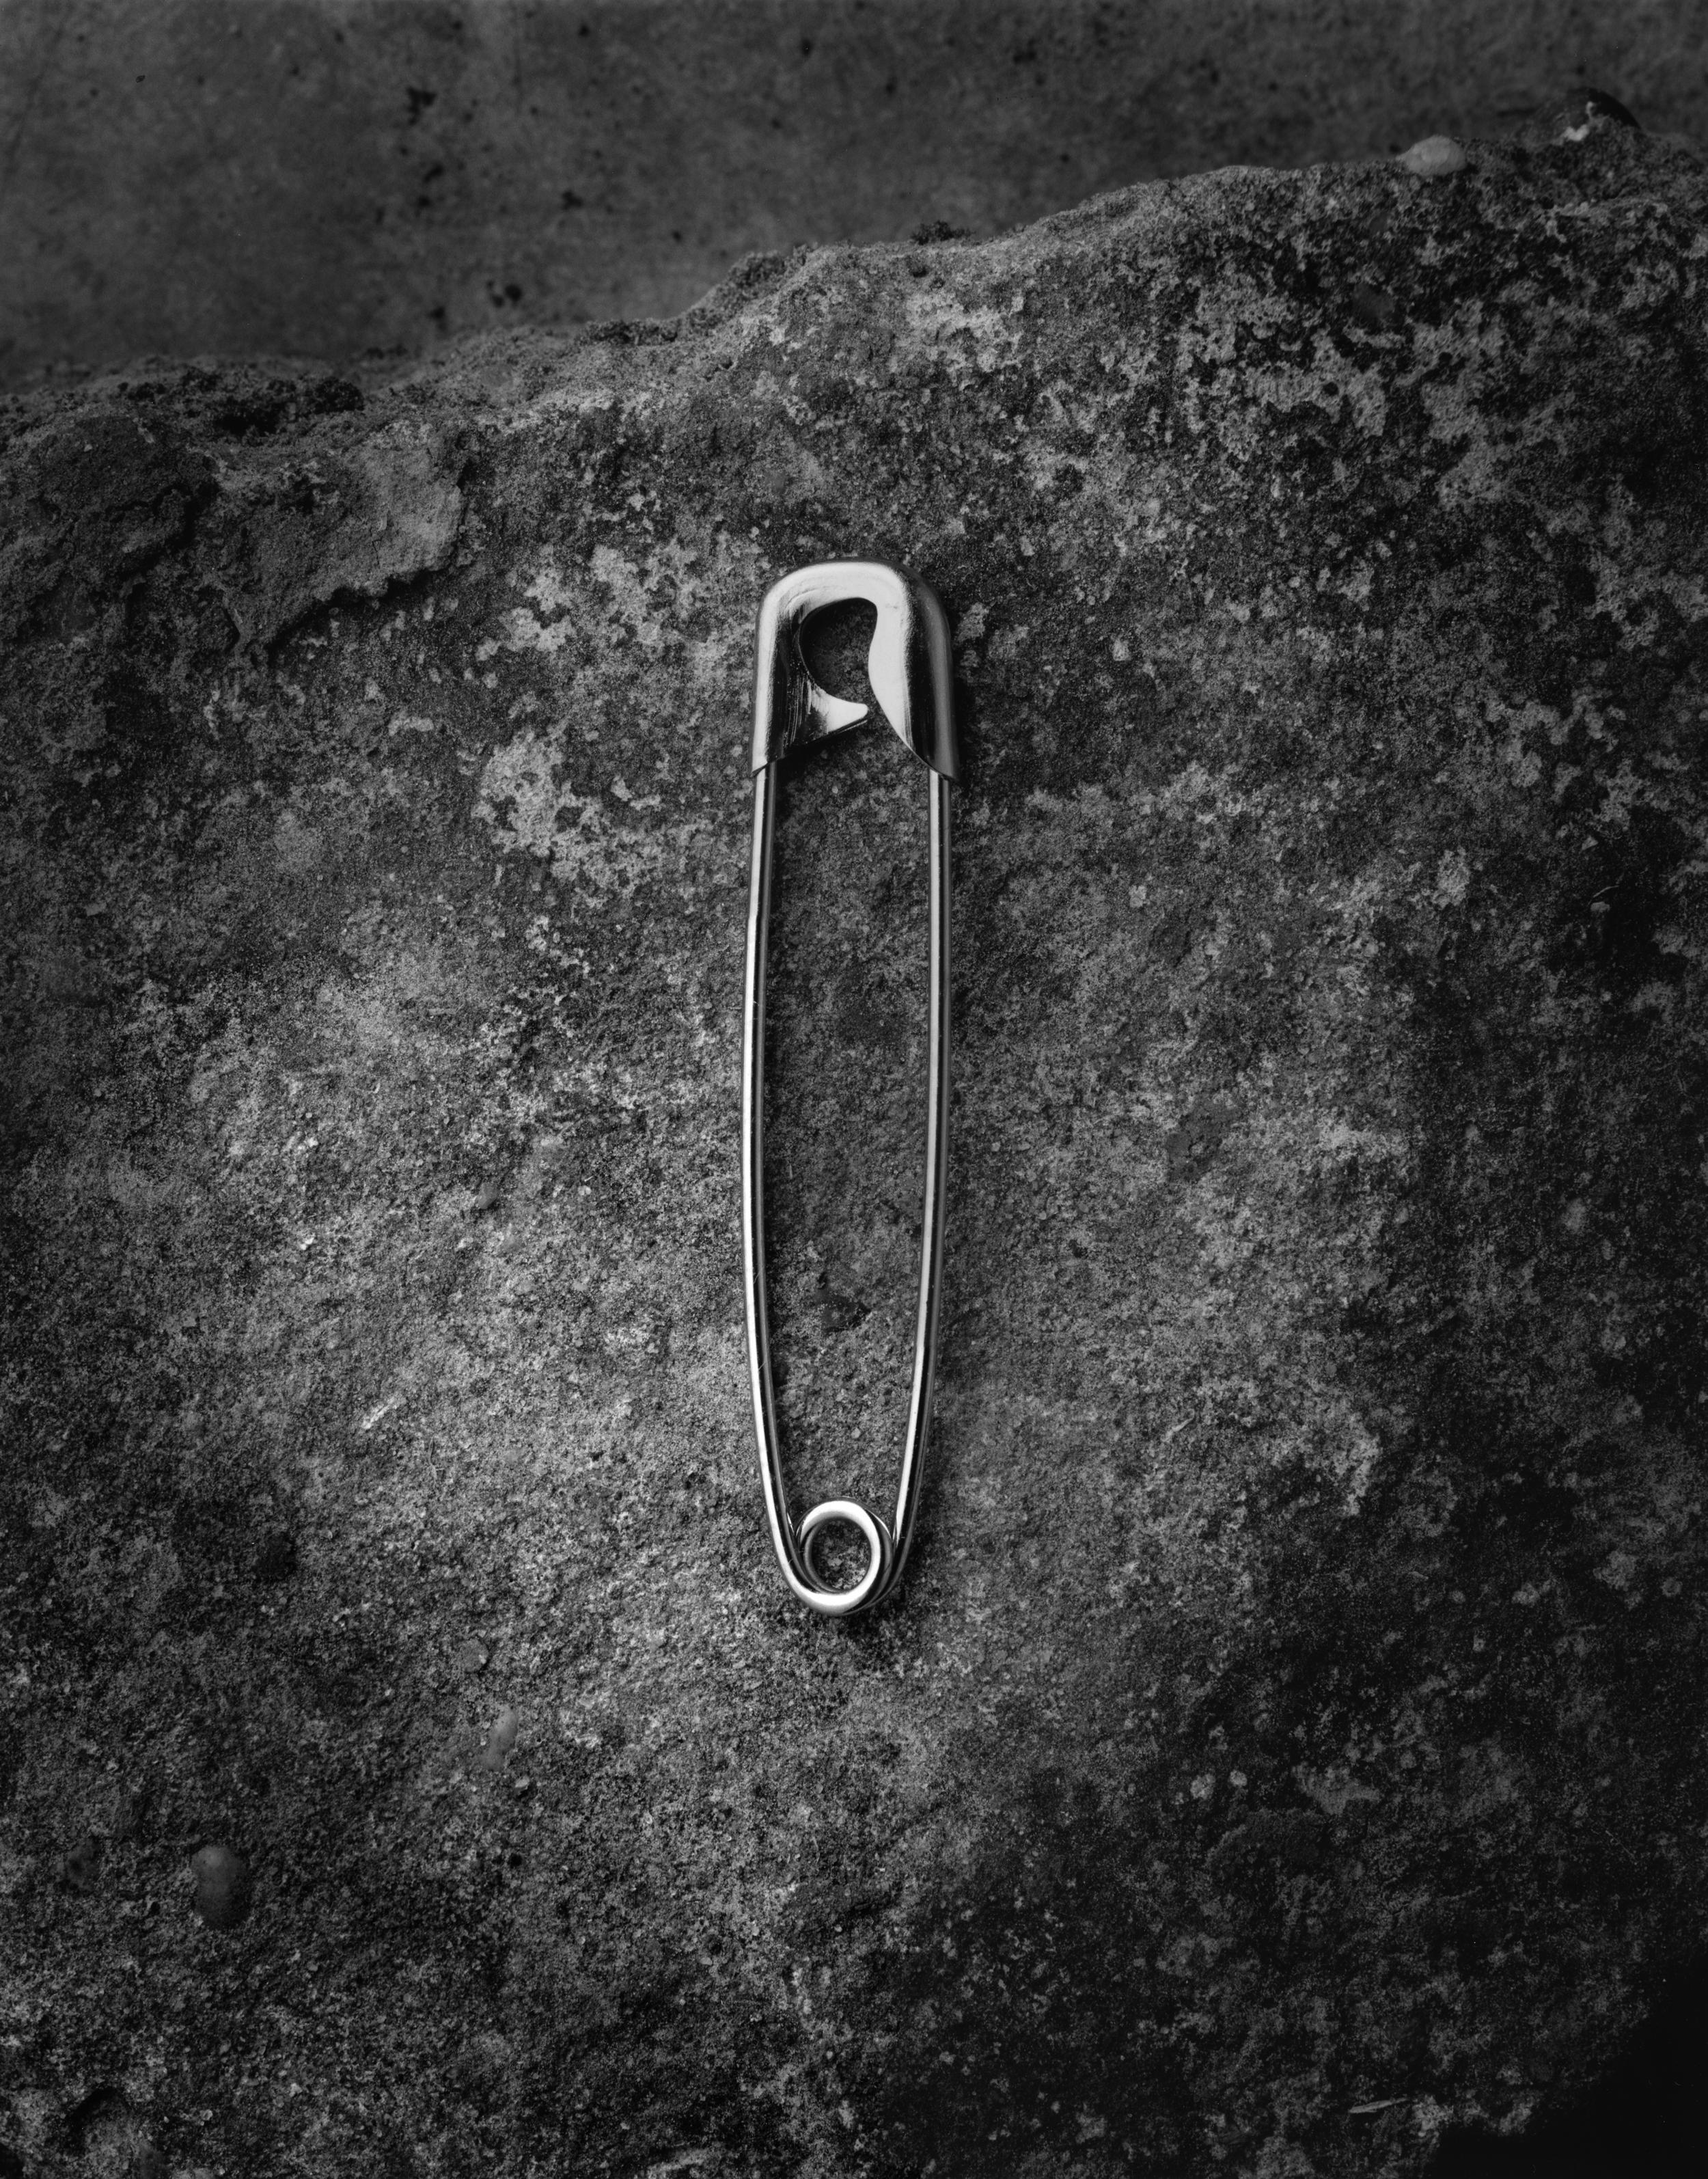 Safety Pin #1